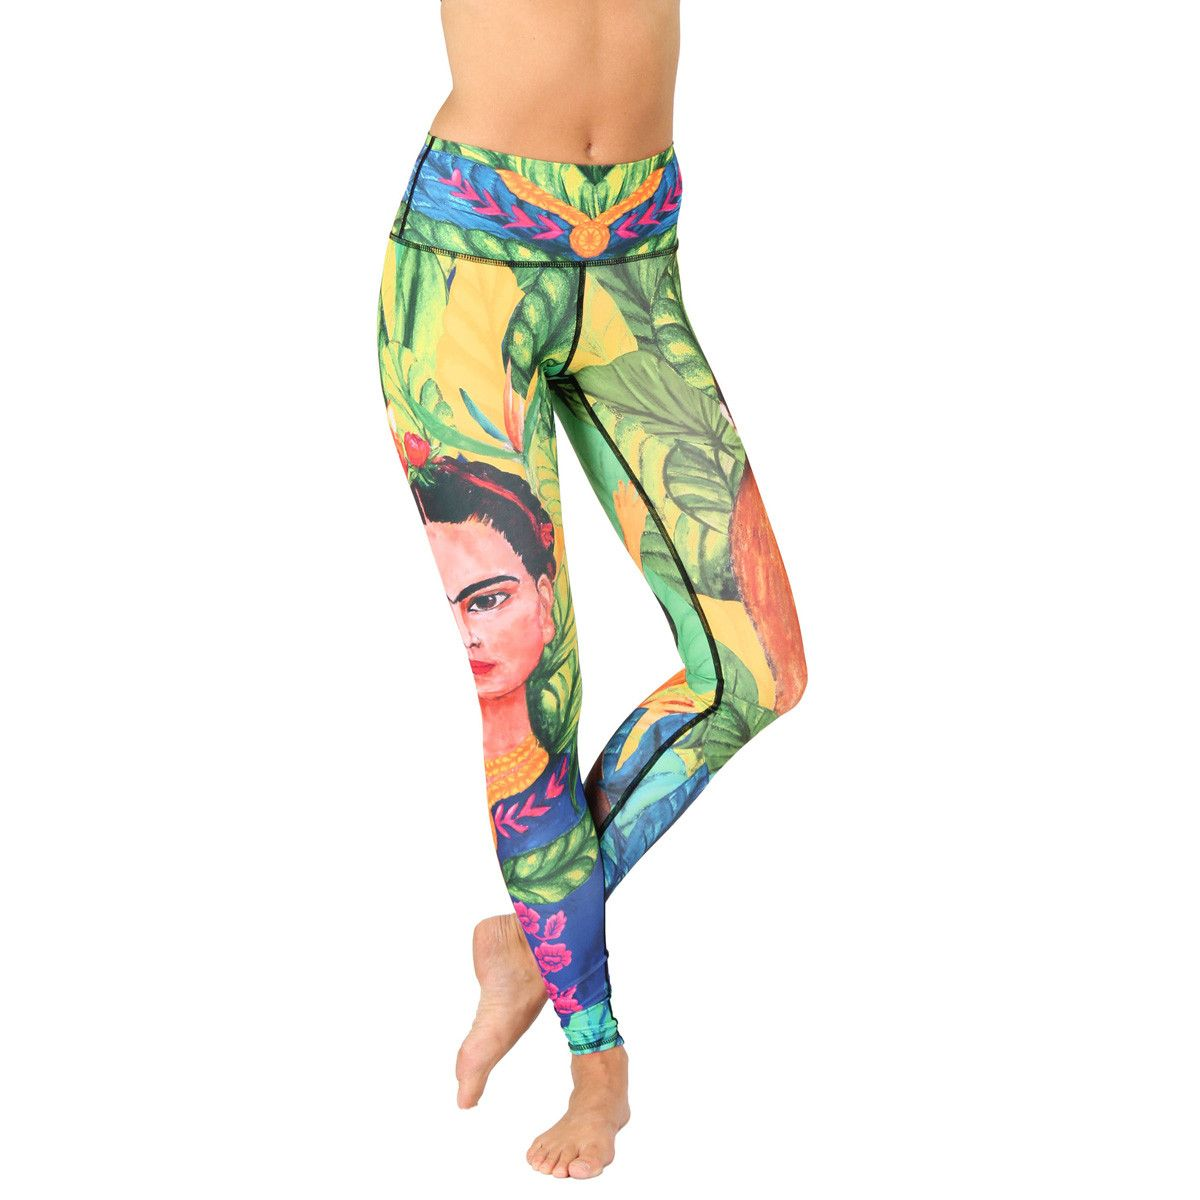 47d2292396 Eco-friendly Full-Length The Frida/Frida Kahlo Printed Yoga Leggings (Front  View)